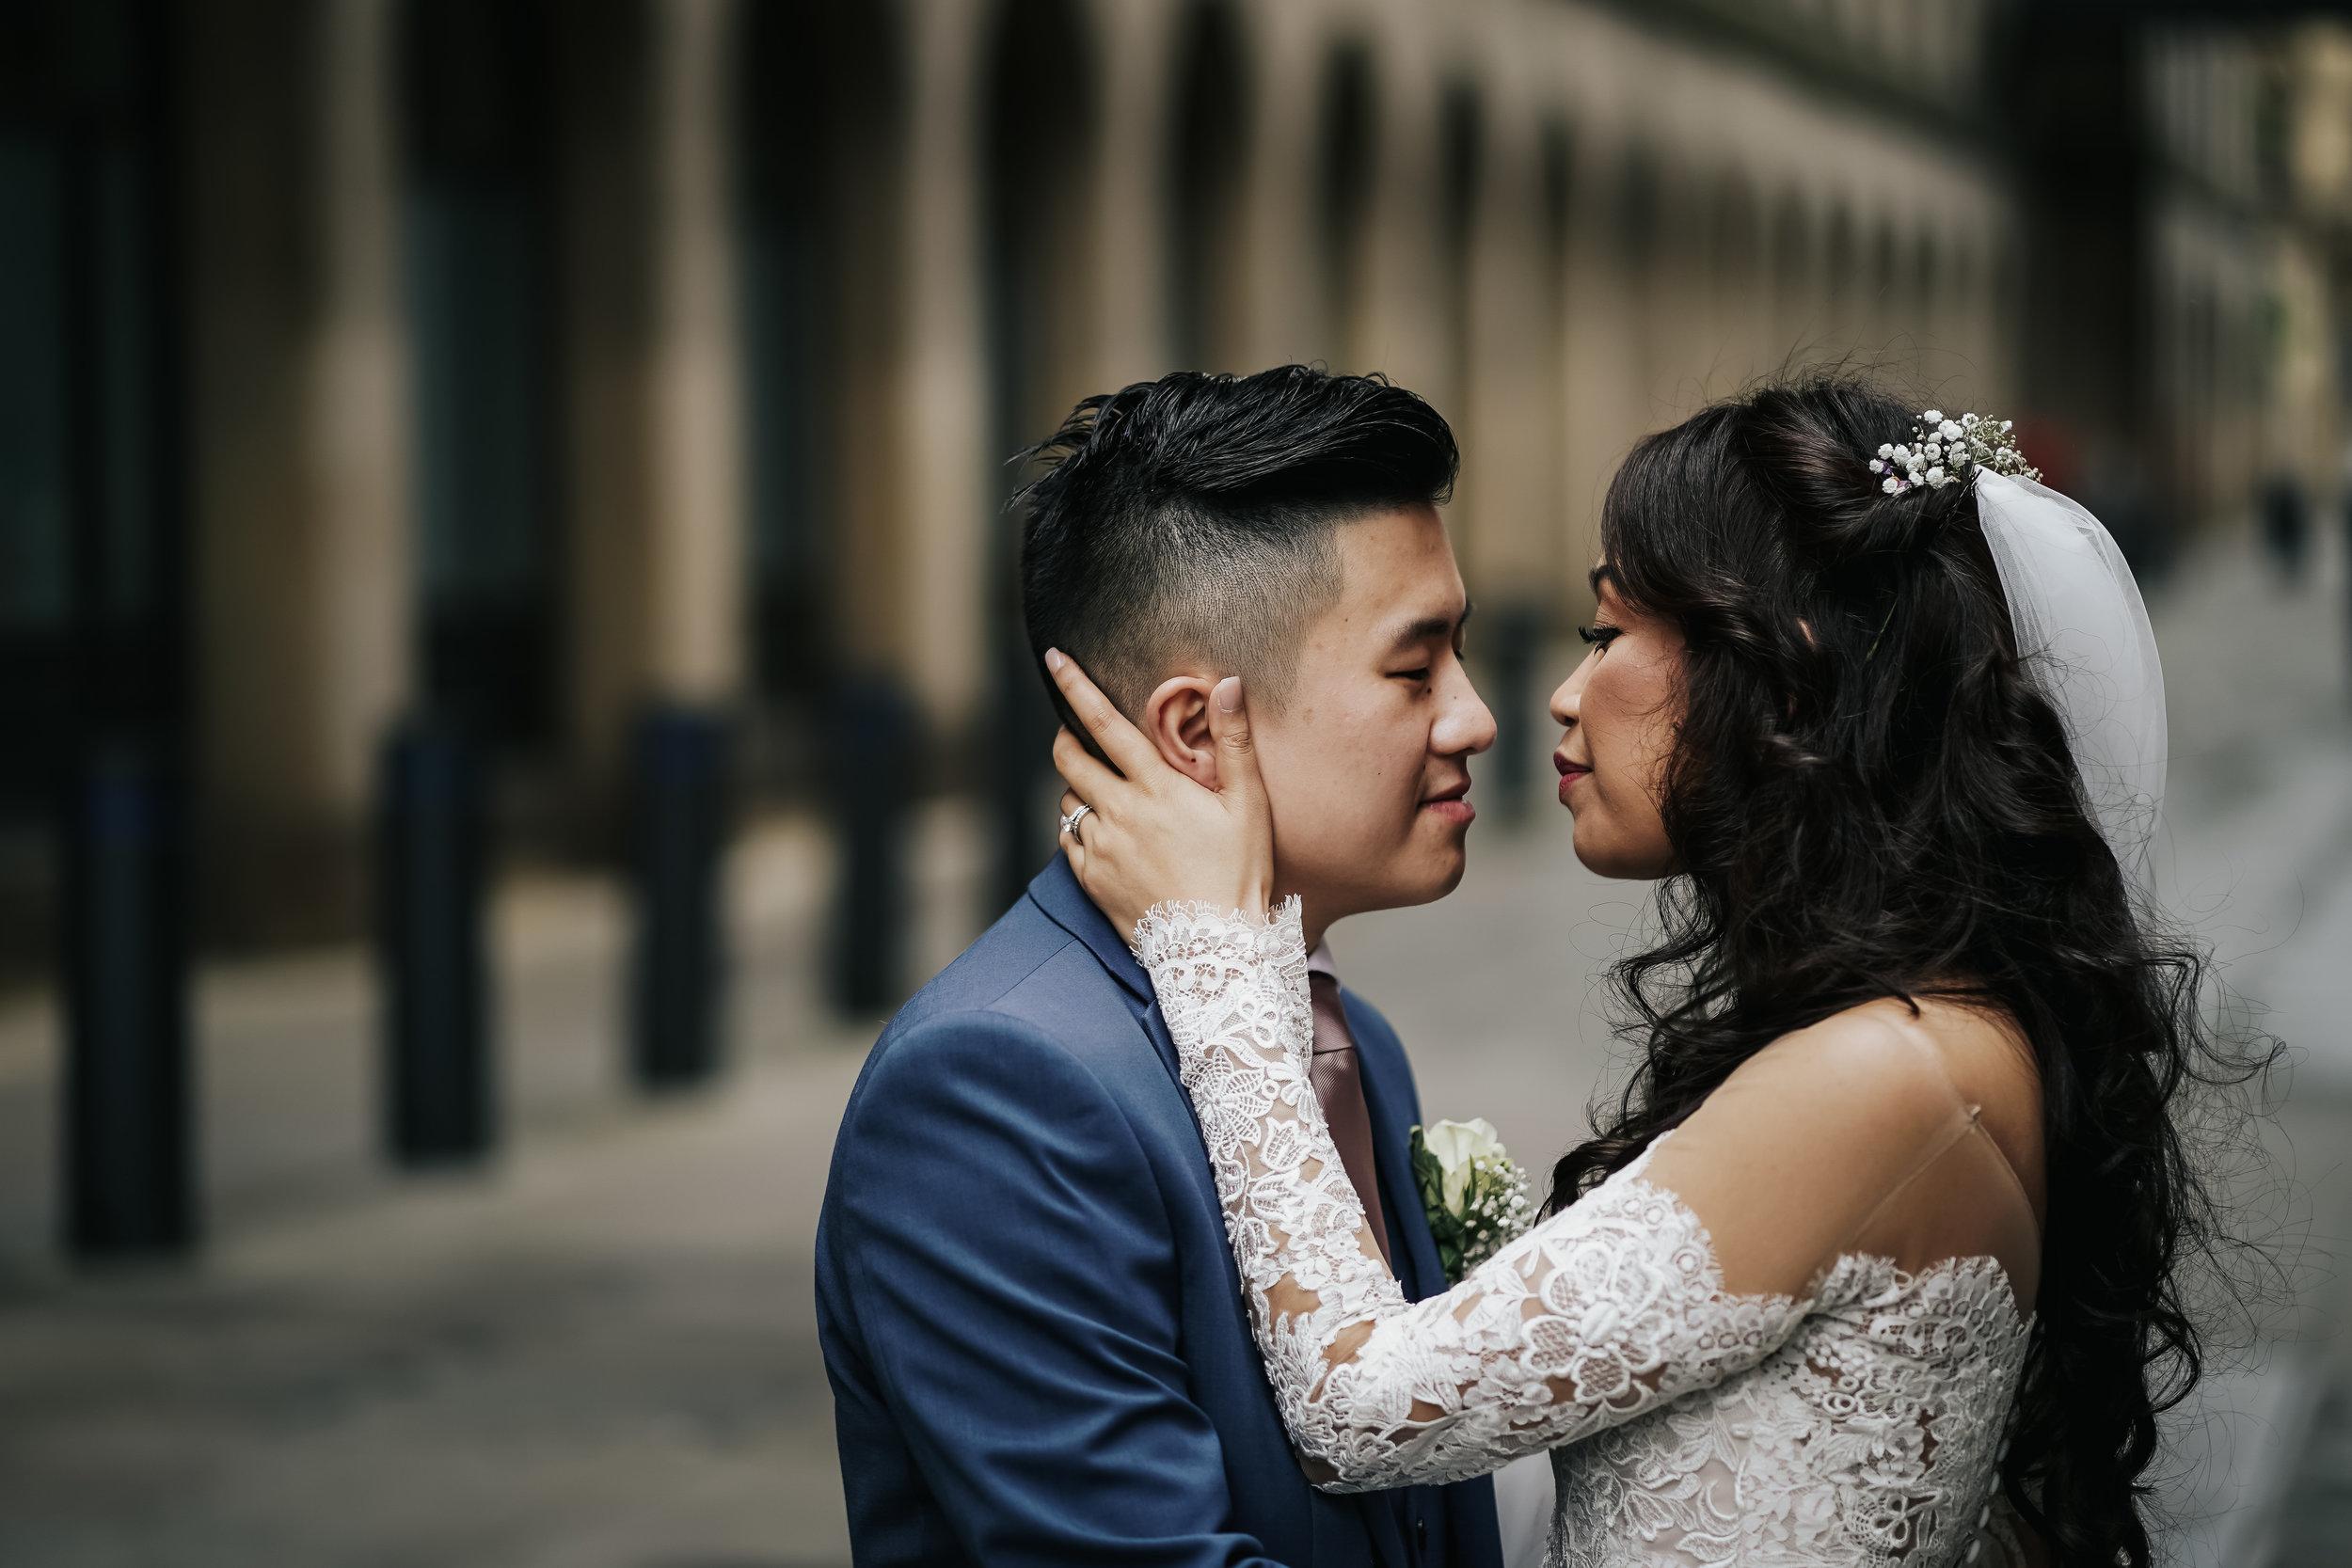 Chinese Wedding Photography Manchester wedding photographer Cheshire - 030.jpg